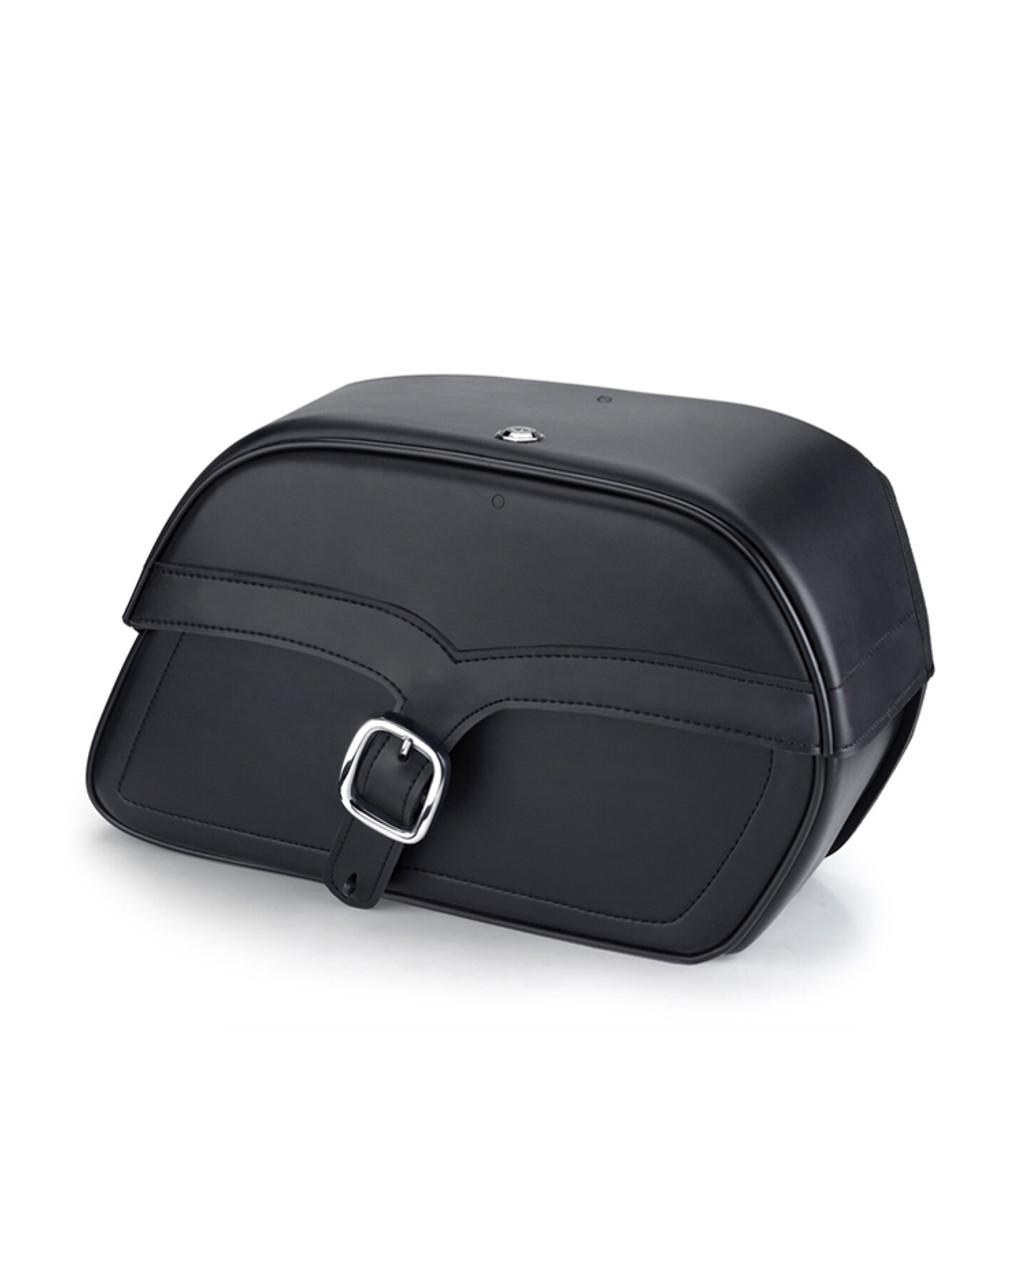 Honda VTX 1800 N Medium Charger Single Strap Motorcycle Saddlebags Main Bag View